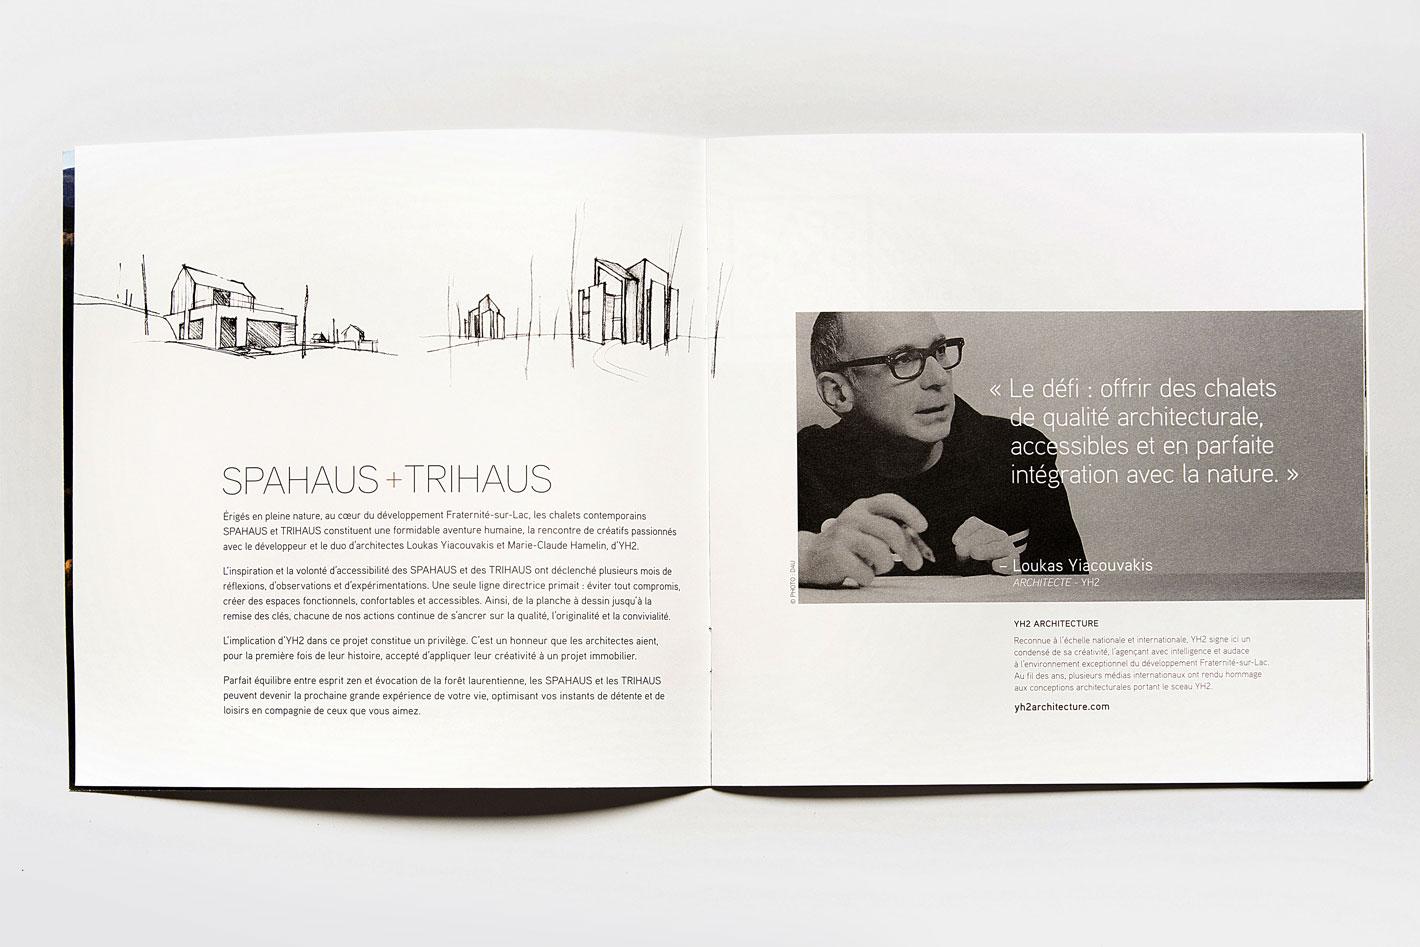 Spahaus_IMGS_1420x947Brochure-Spahaus-Trihaus-2